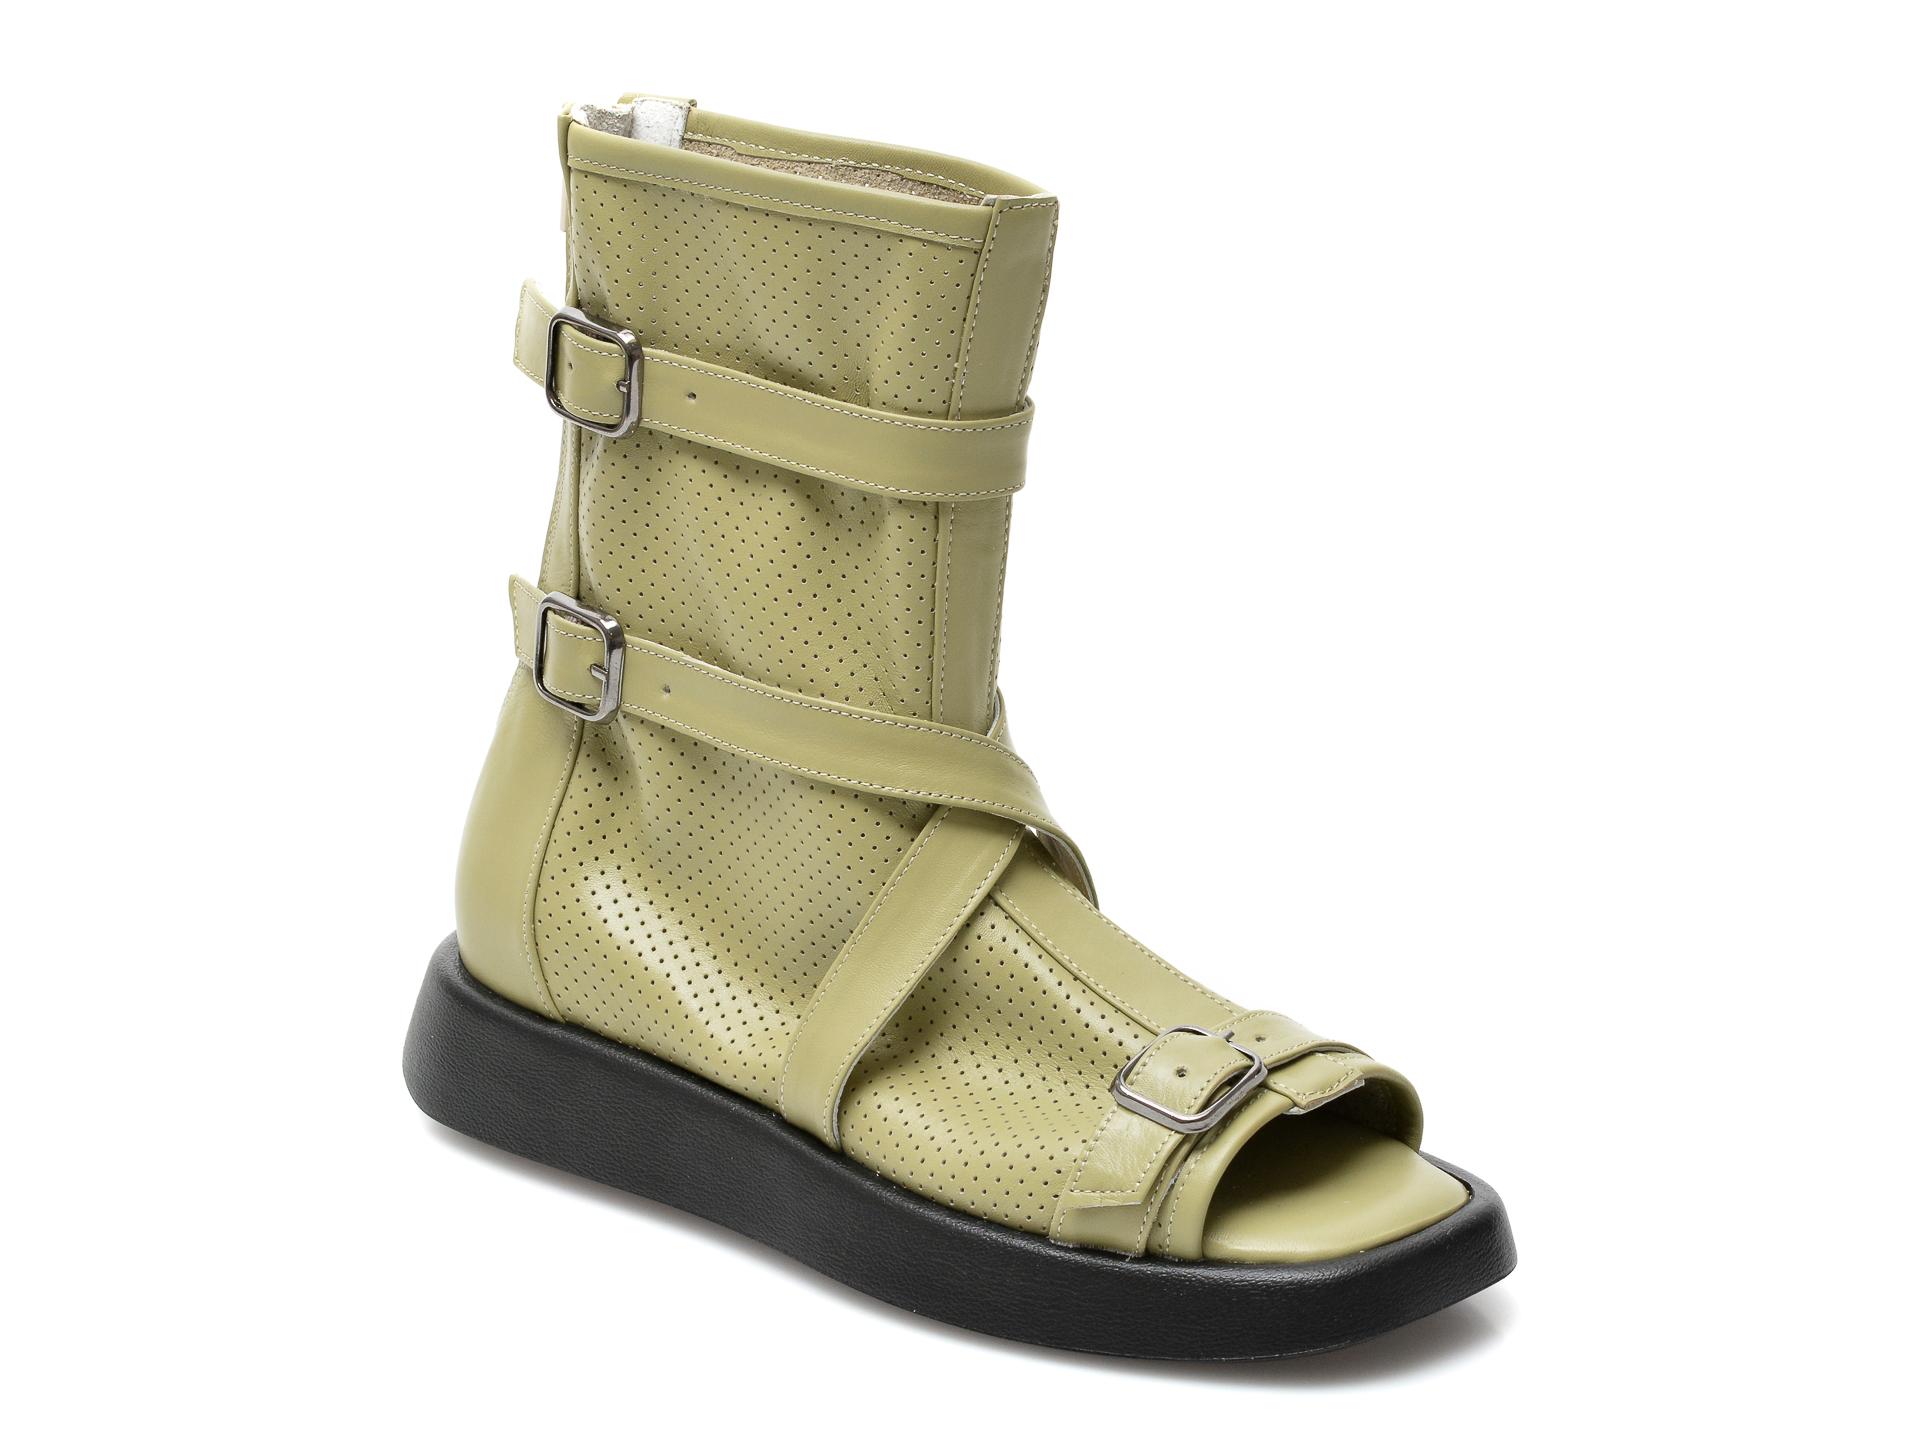 Sandale IMAGE, 4443760, din piele naturala imagine 2021 Image